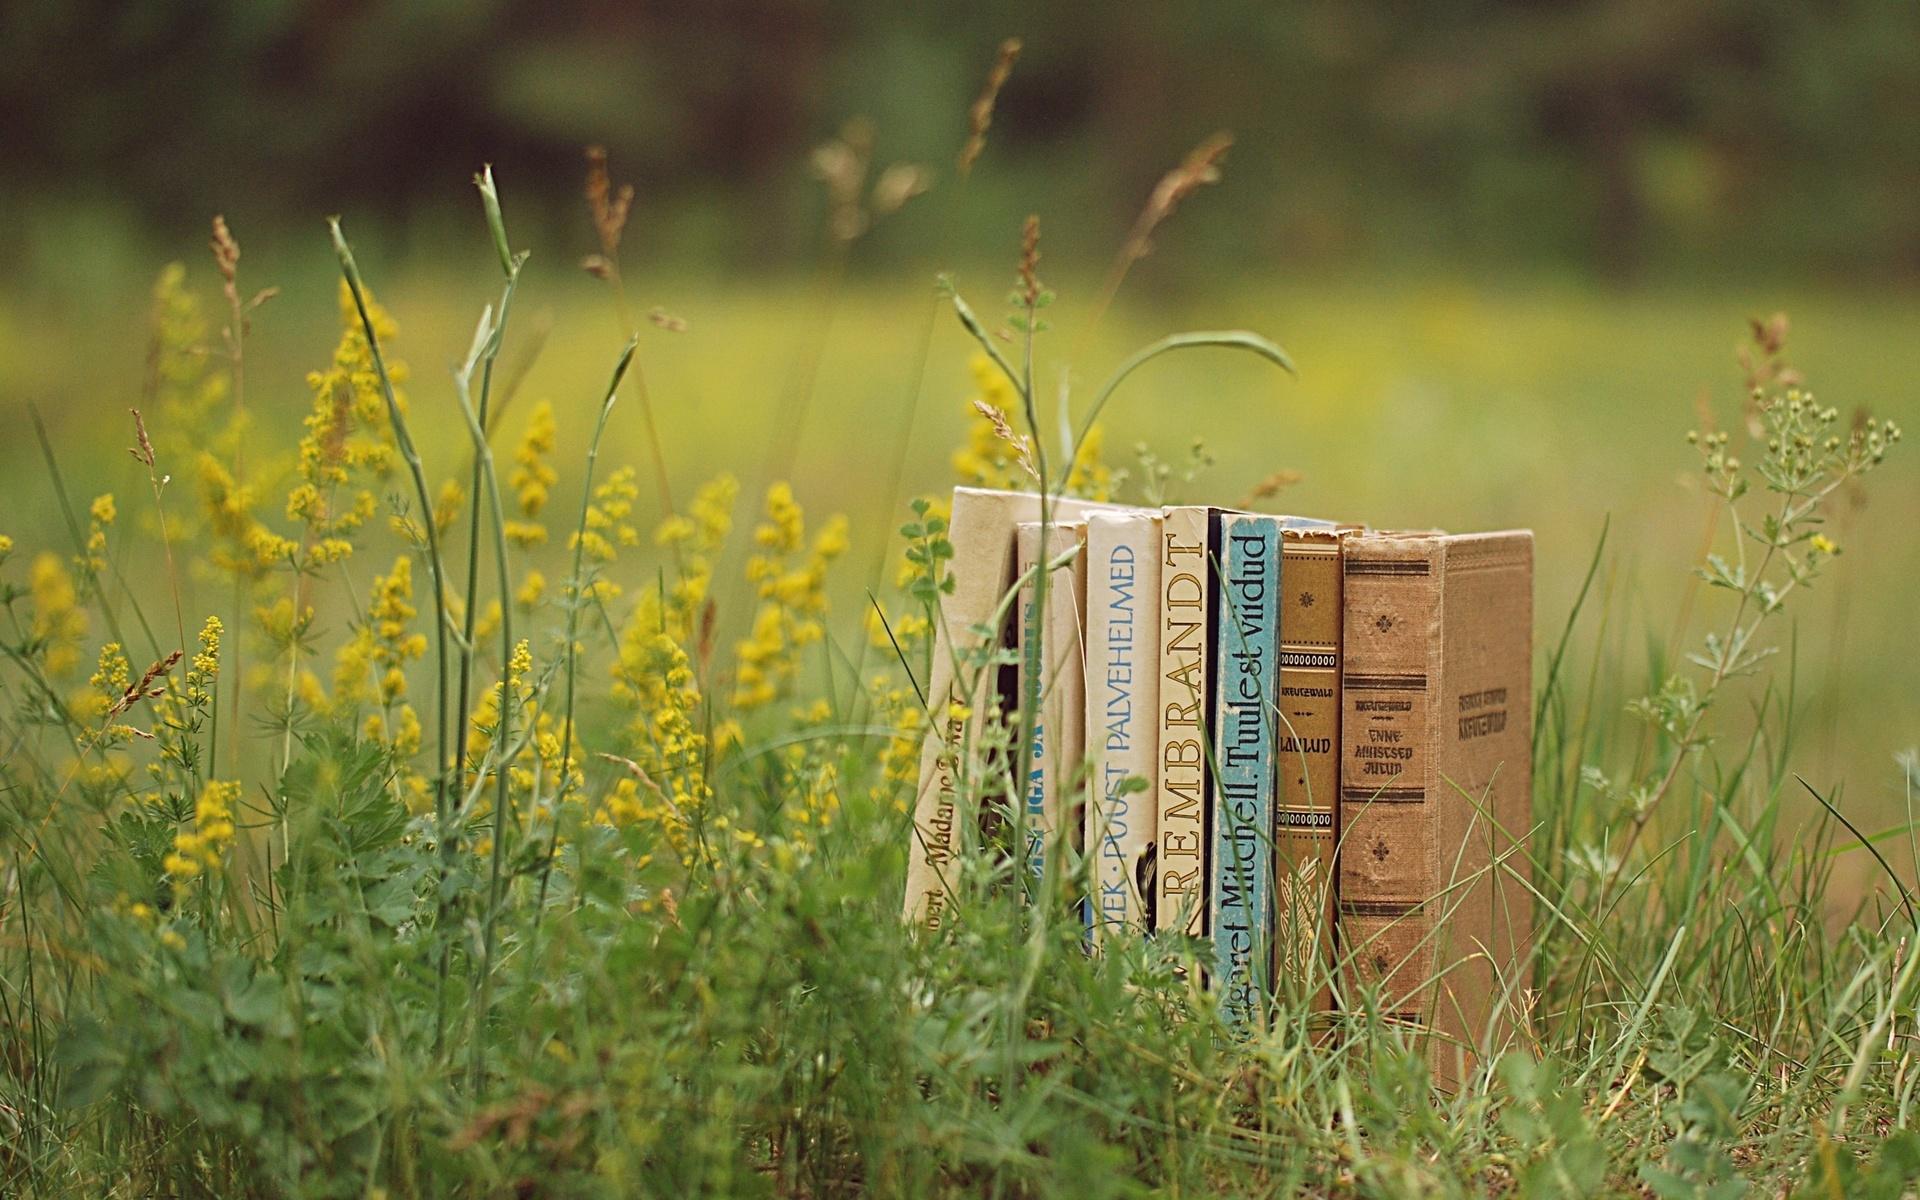 красиво, книги, поляна, трава, зелень